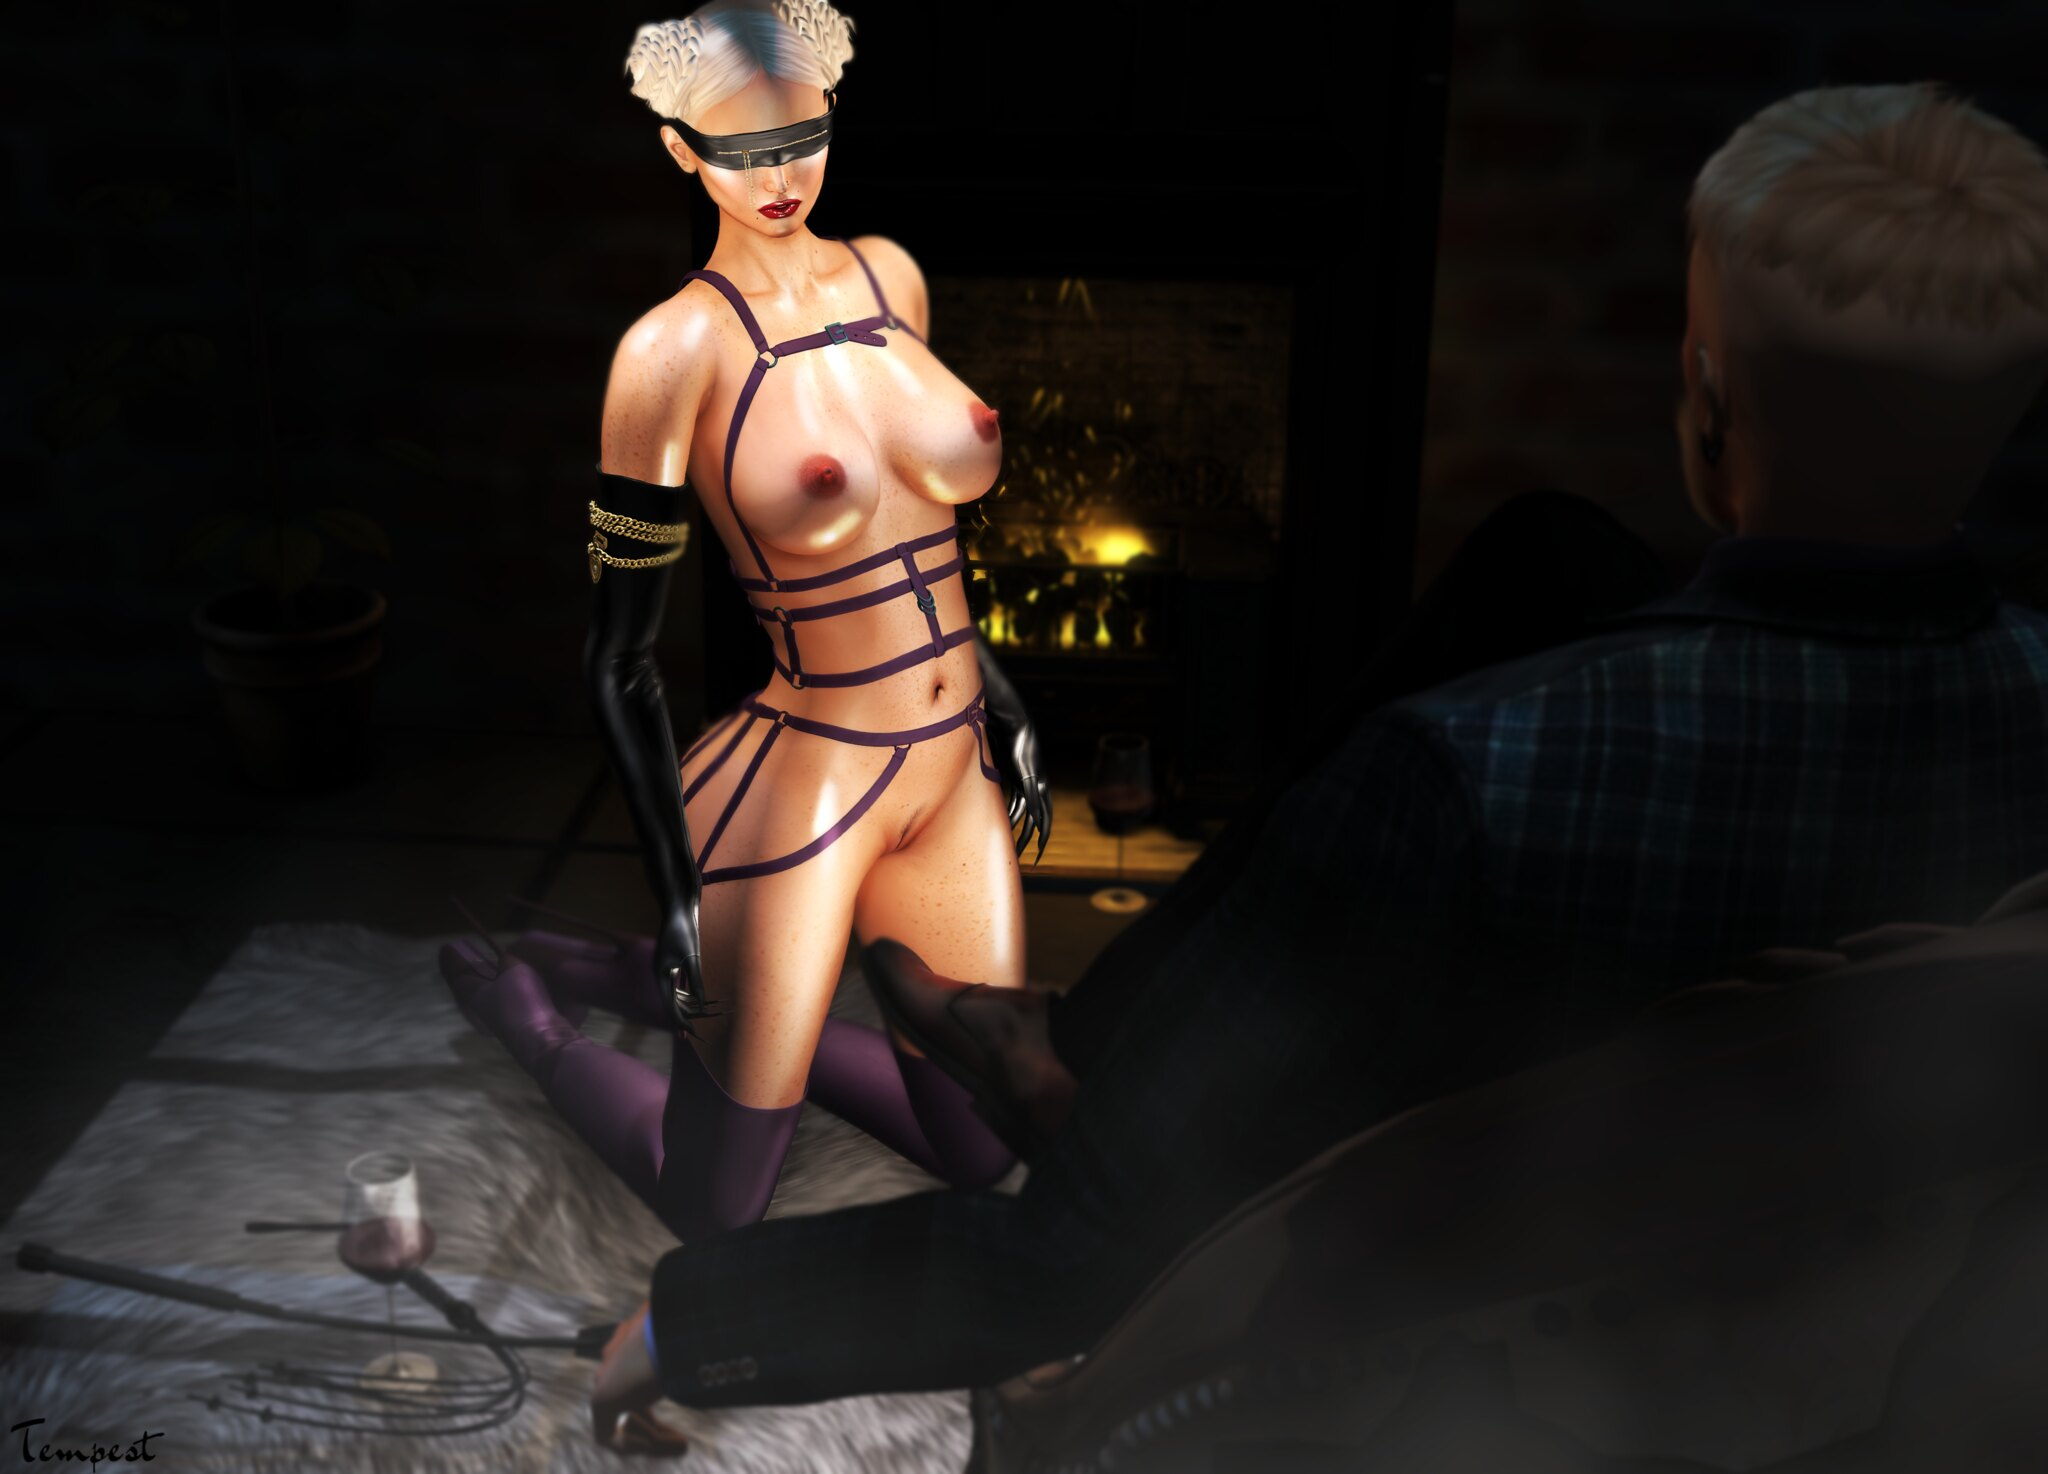 Belt Up, Betty! Ready?